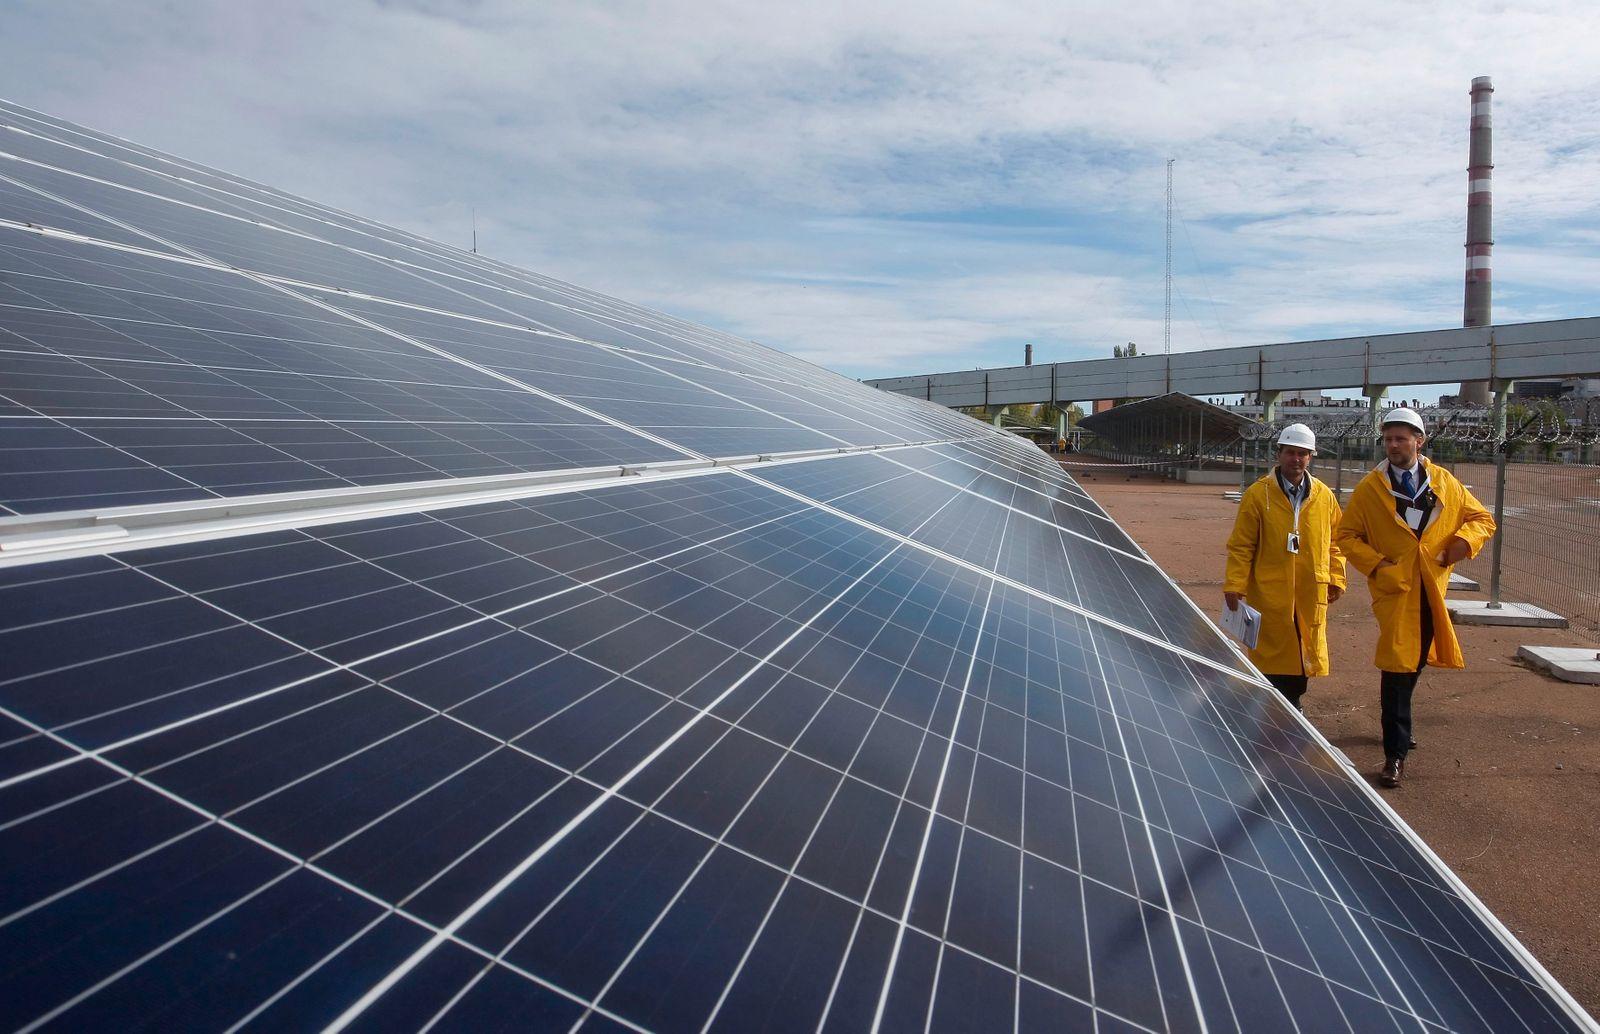 A solar power plant in the Chernobyl zone of Ukraine